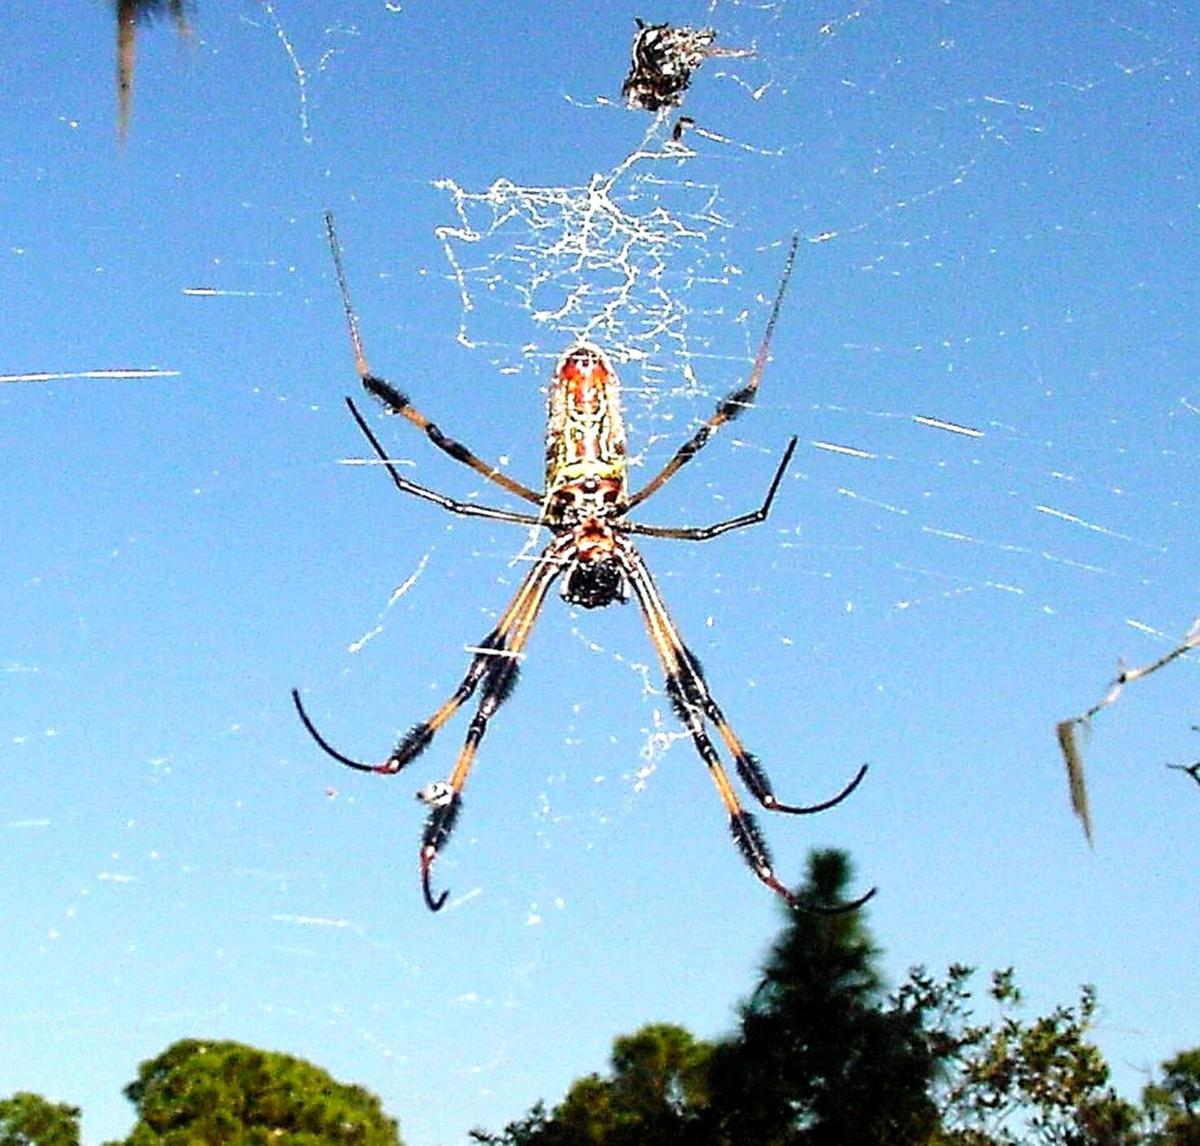 Golden Silk spider against blue sky